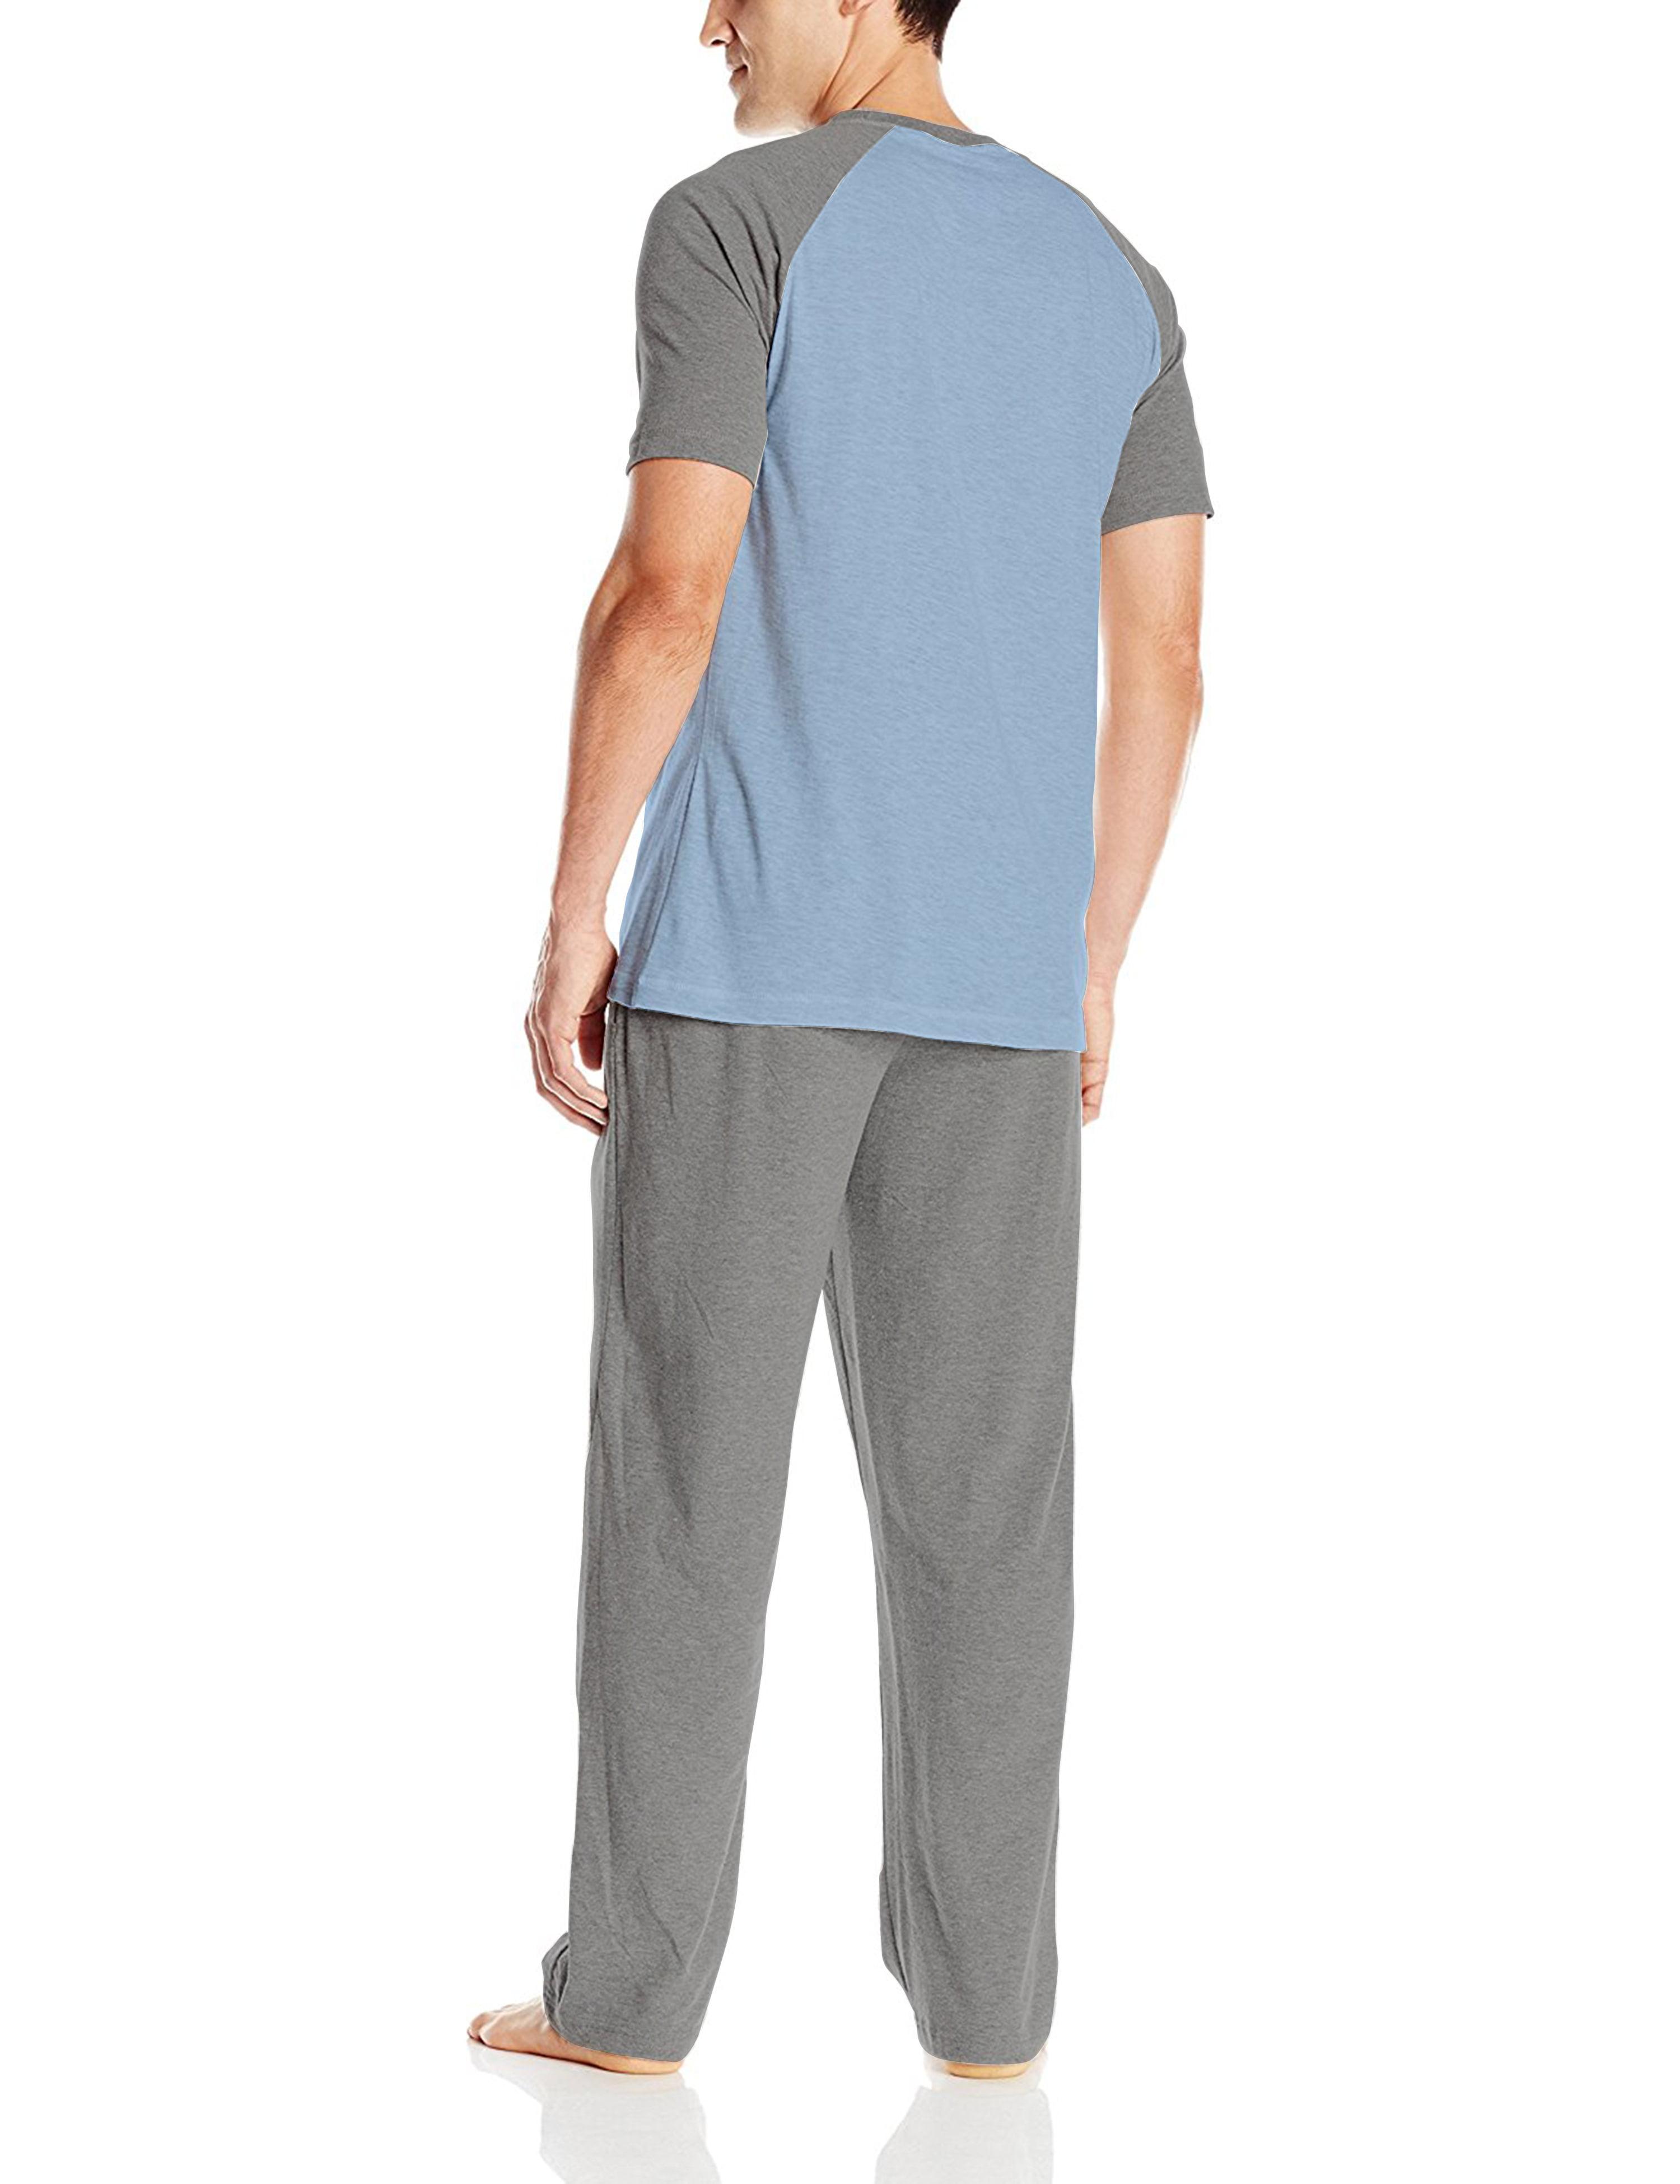 aacaac196c Hanes - Hanes Men's Adult X-Temp Short Sleeve Cotton Raglan Shirt and Pants Pajamas  Pjs Sleepwear Lounge Set - Walmart.com